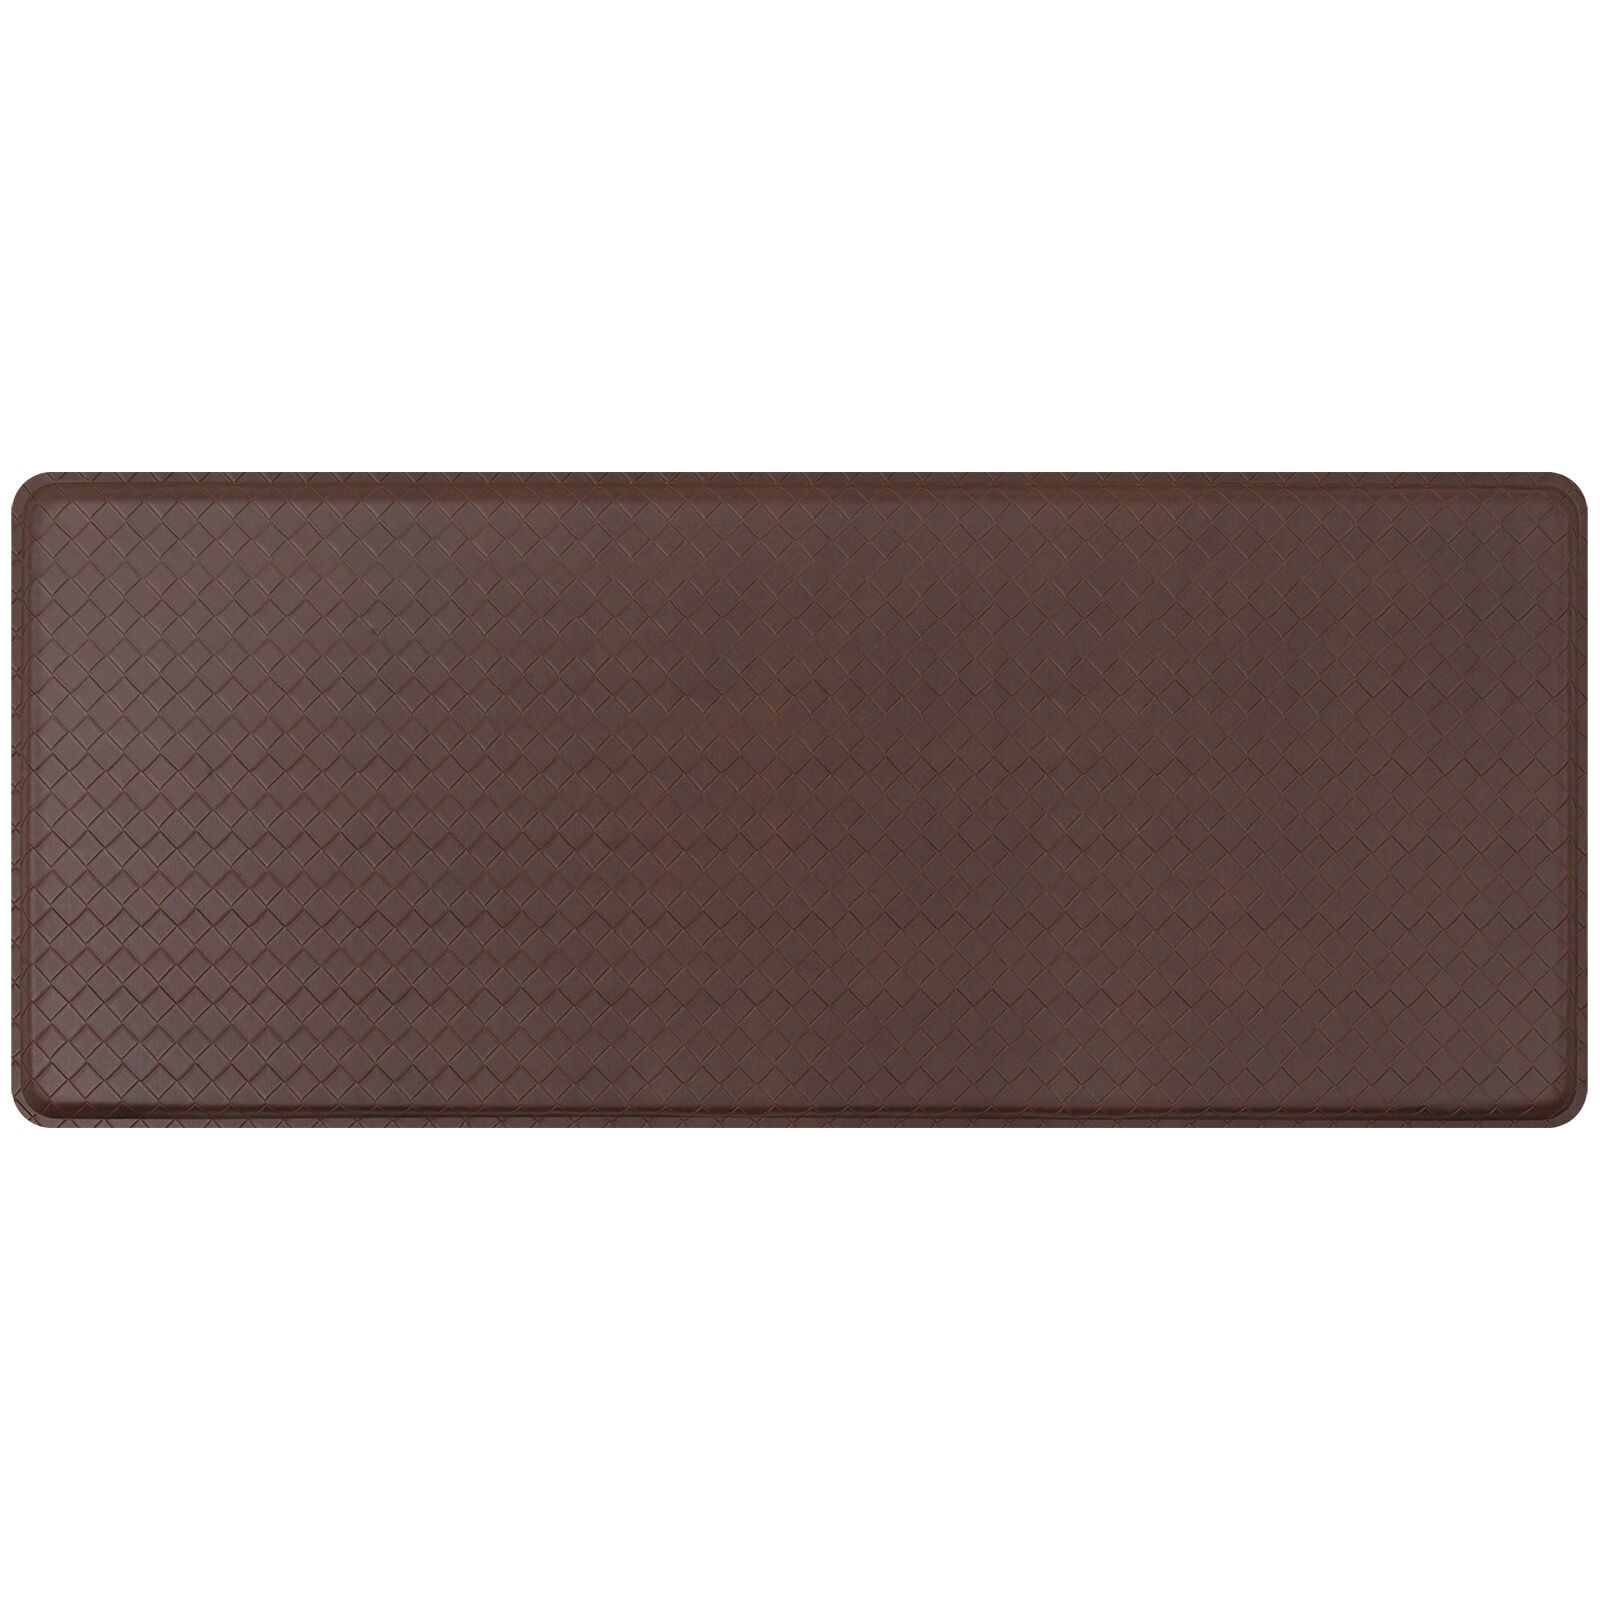 Basketweave Classic Anti-Fatigue Comfort Kitchen Mat Mat Size: 1'8